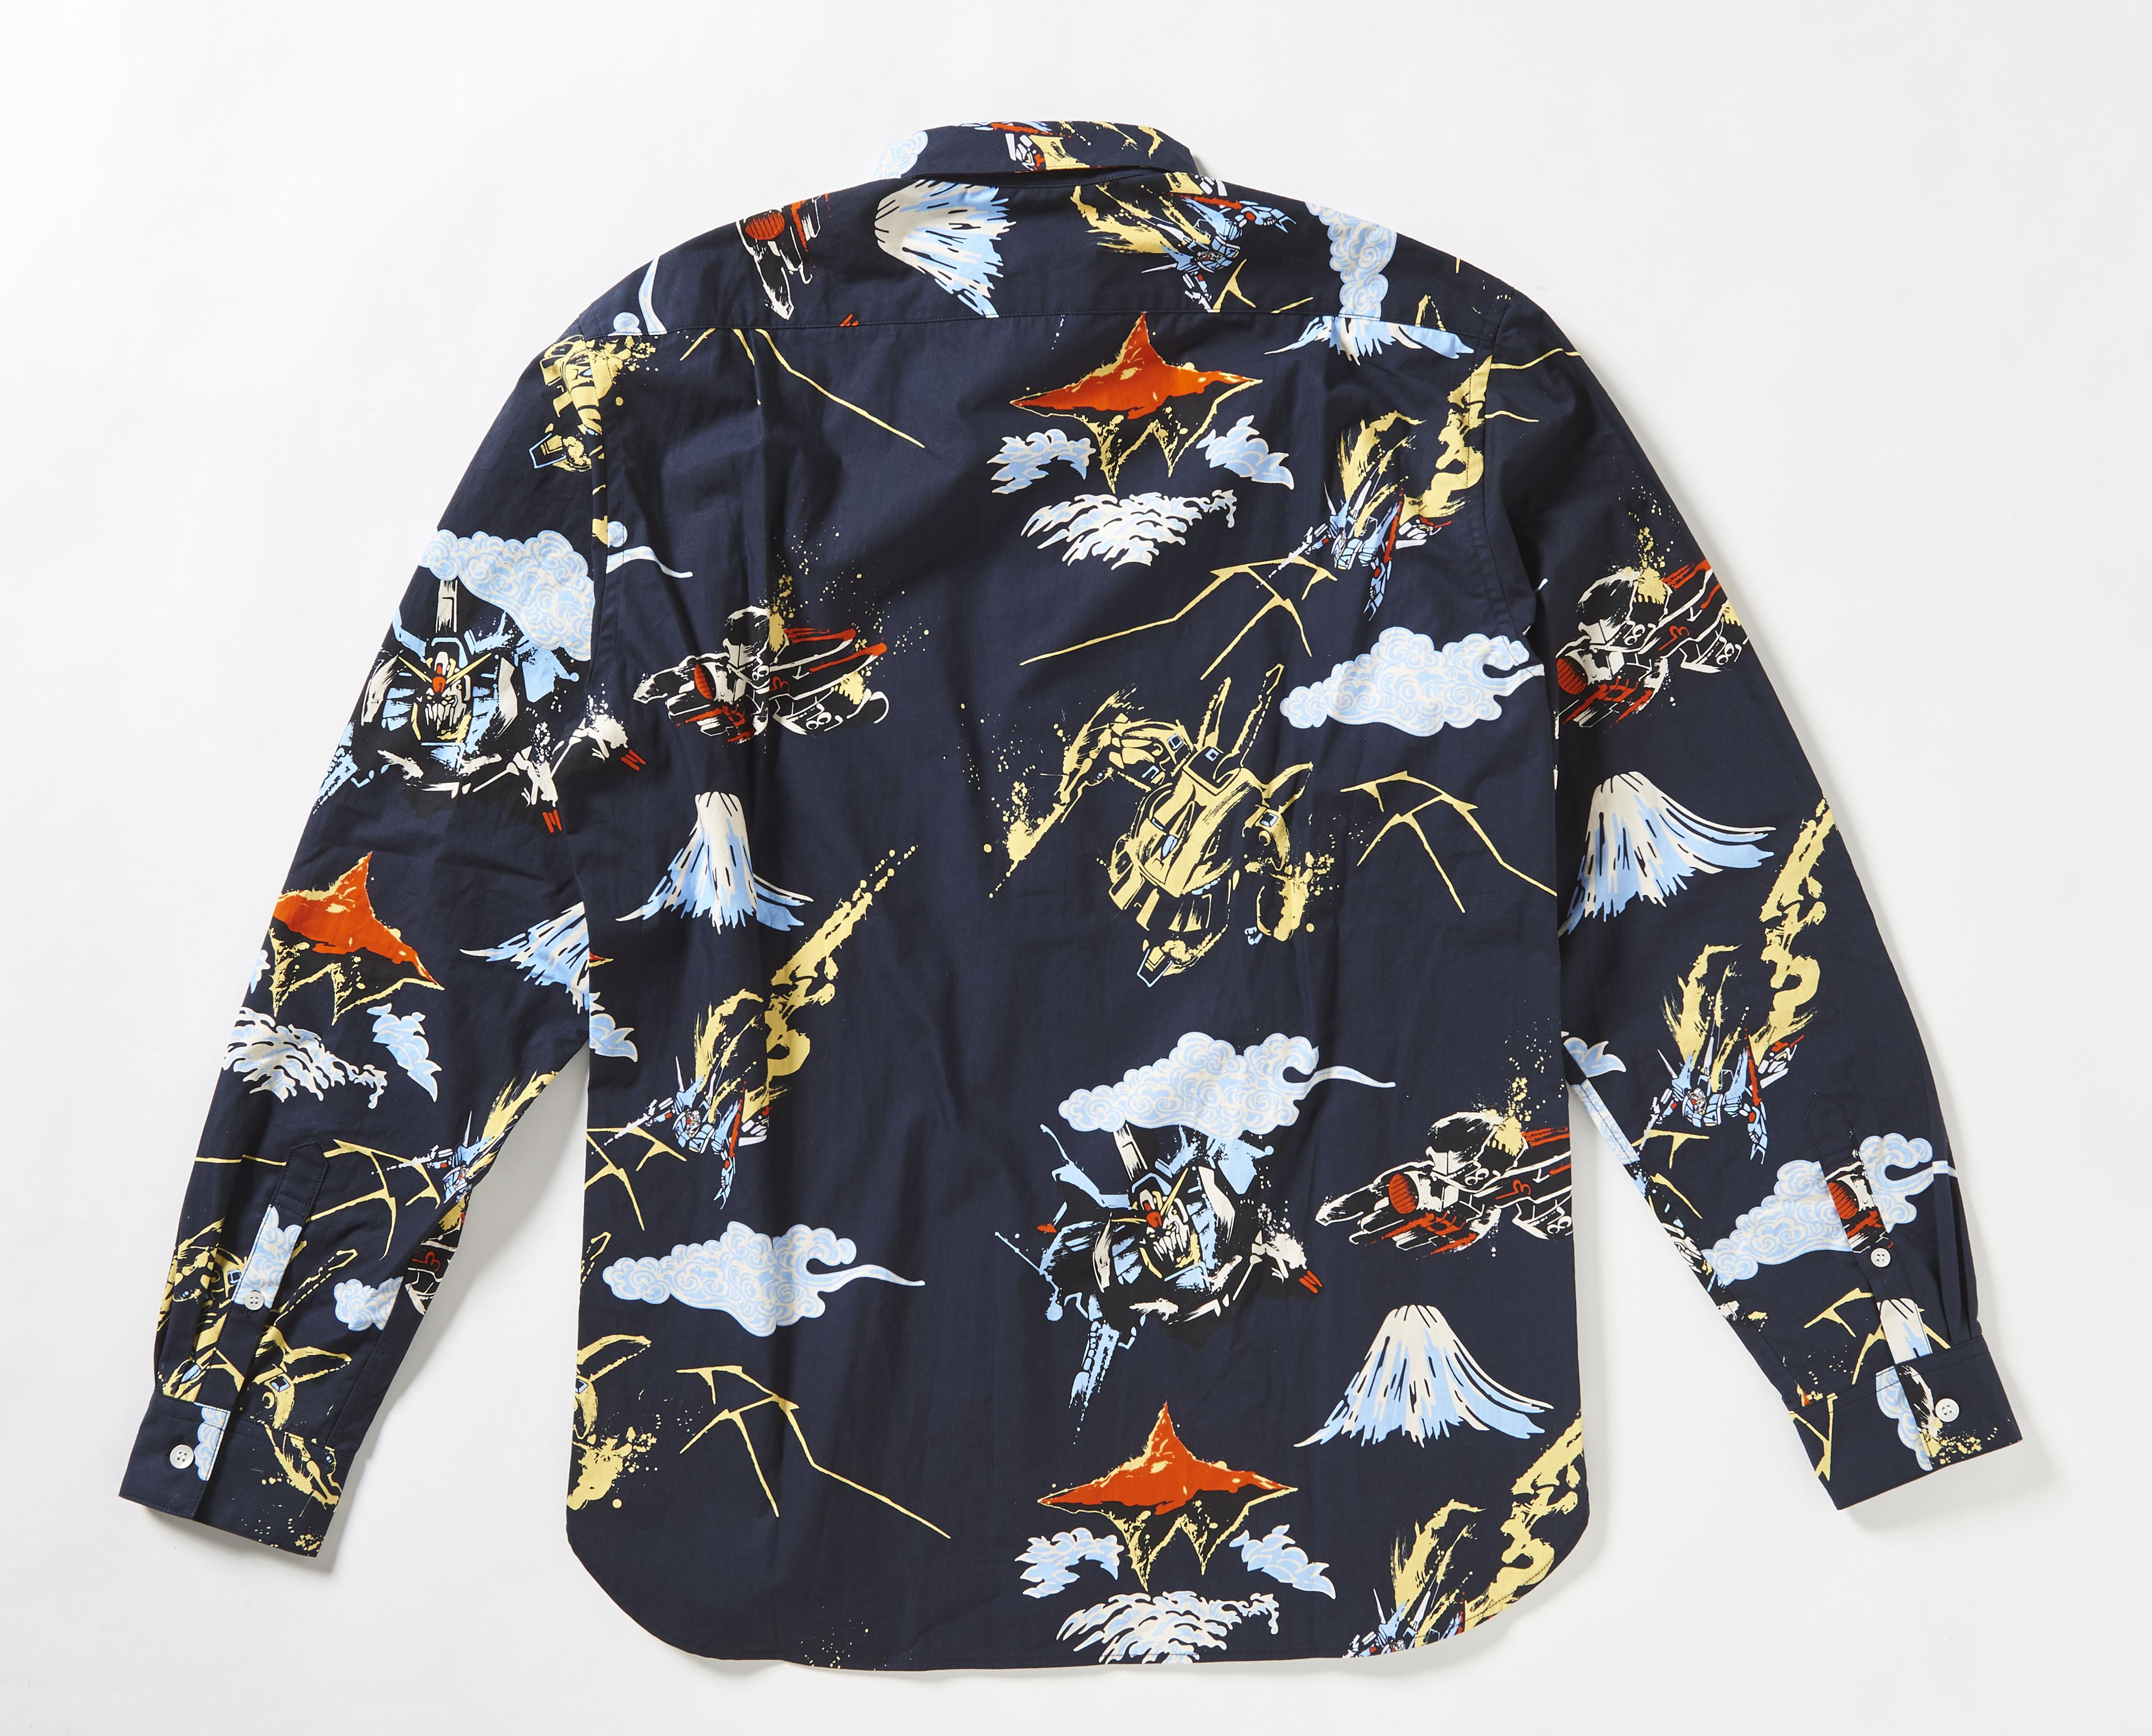 STRICT-G JAPAN 「Z GUNDAM」 Collor shirts THE.O